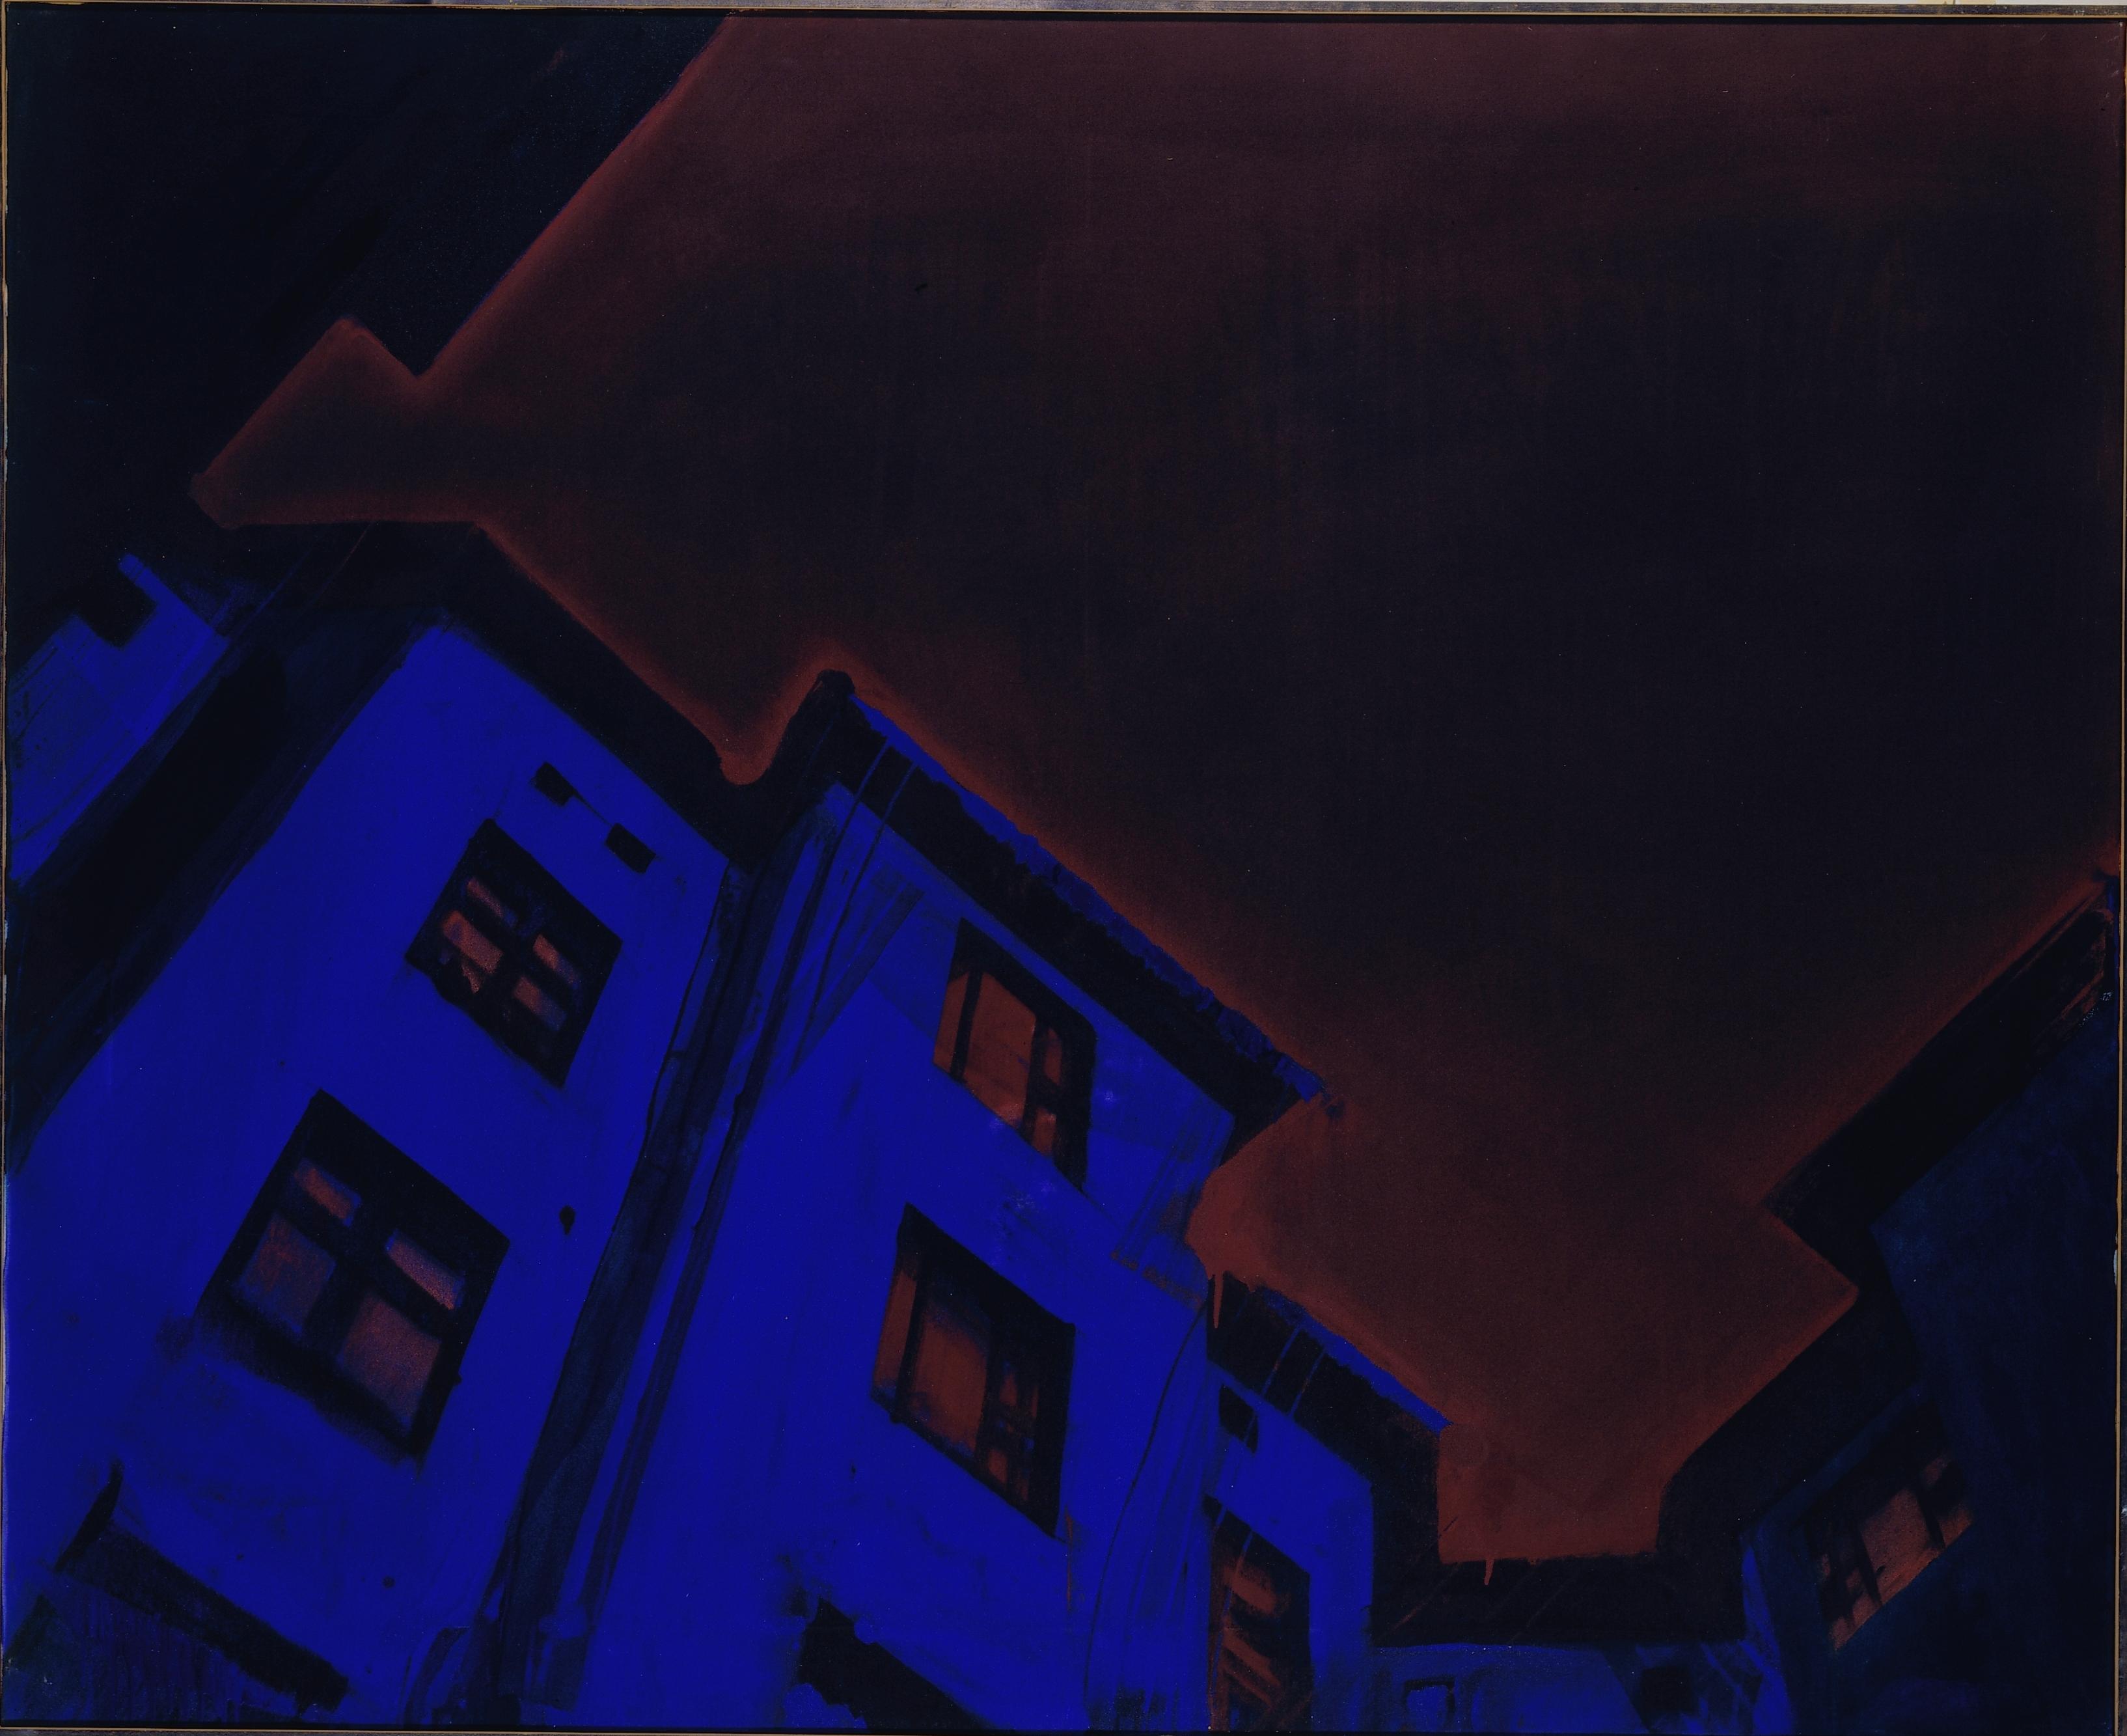 K.H. Hödicke, Himmel über Schöneberg, 1973